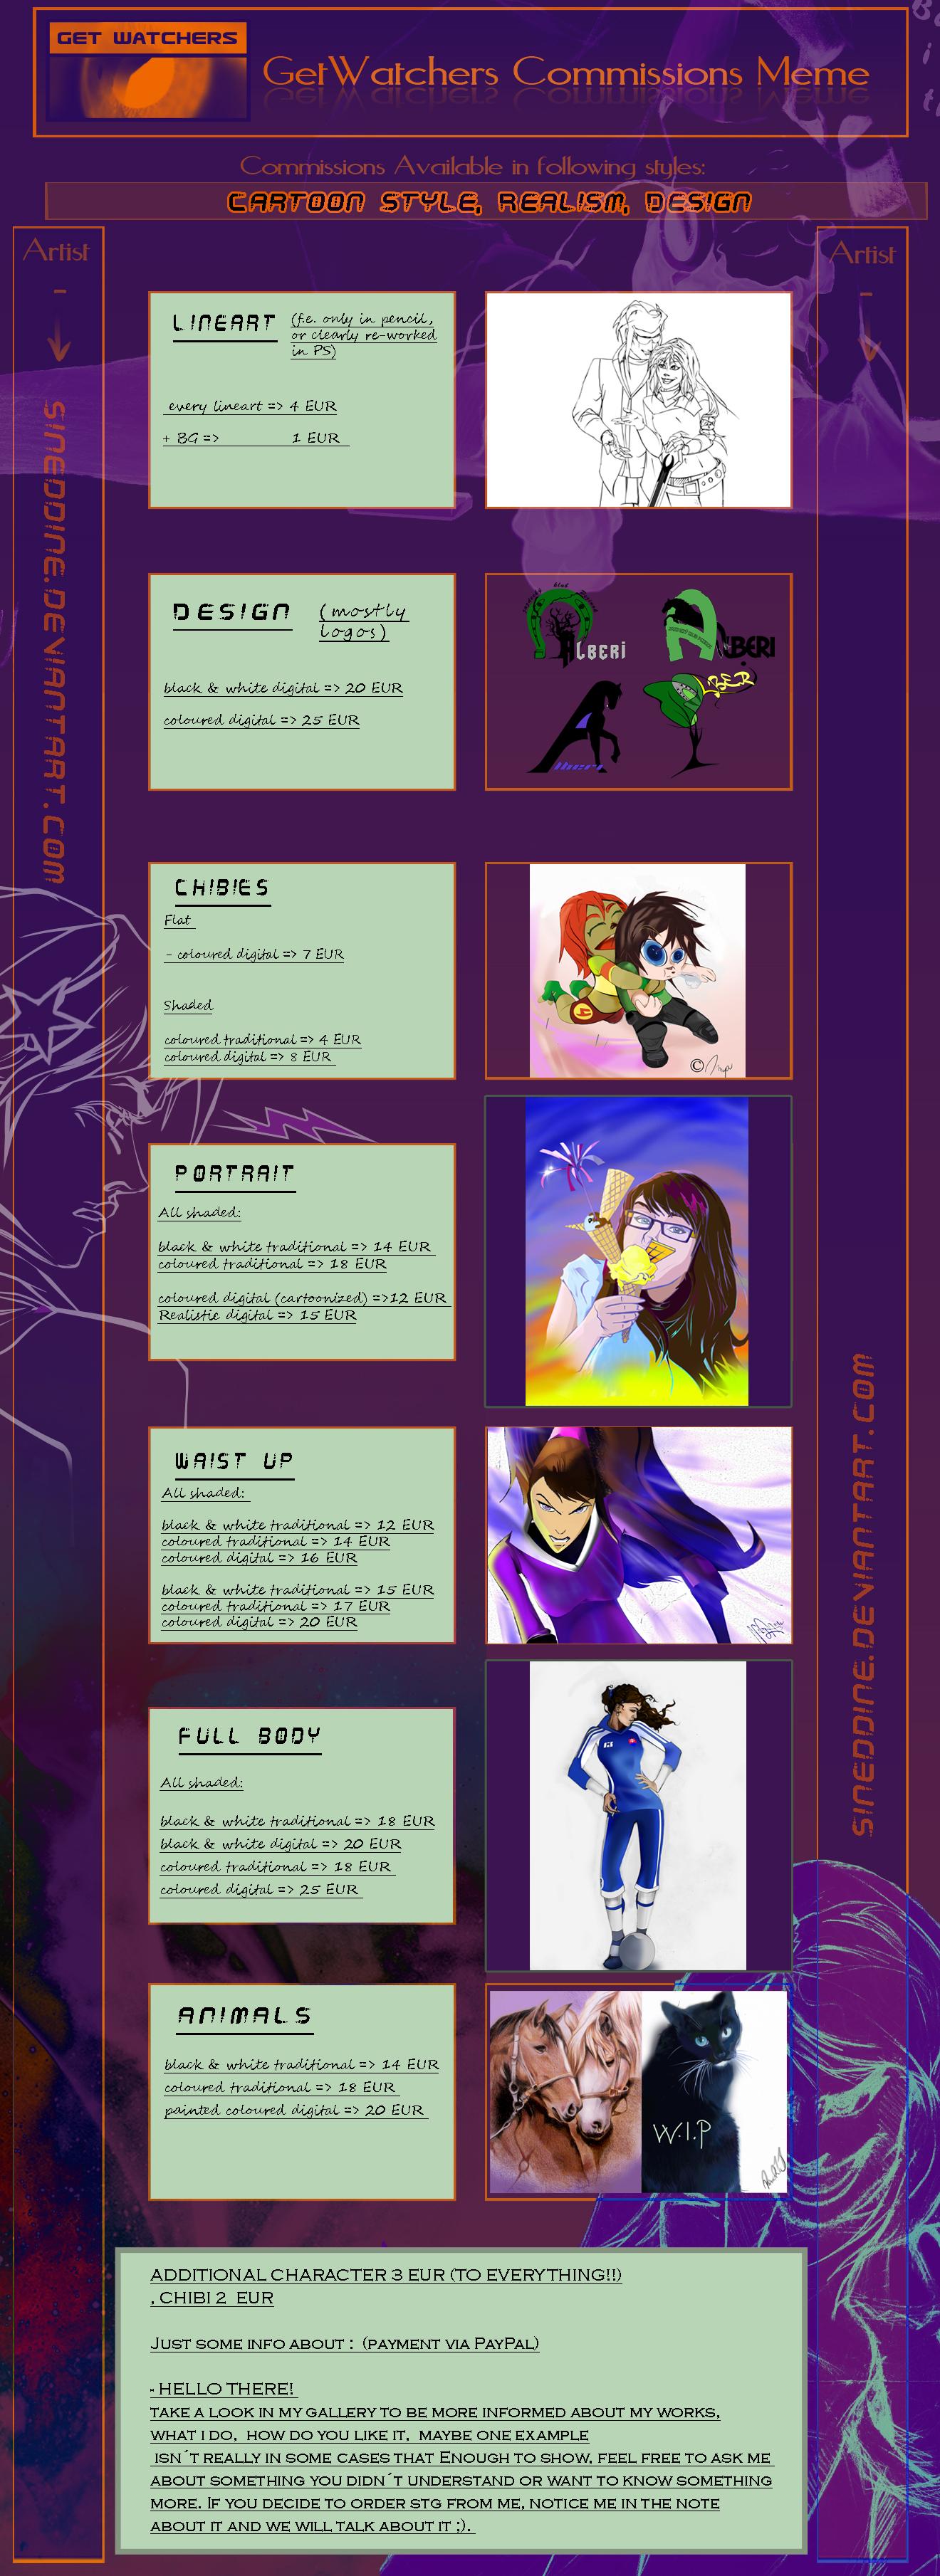 Commissions Info Meme by sineddine